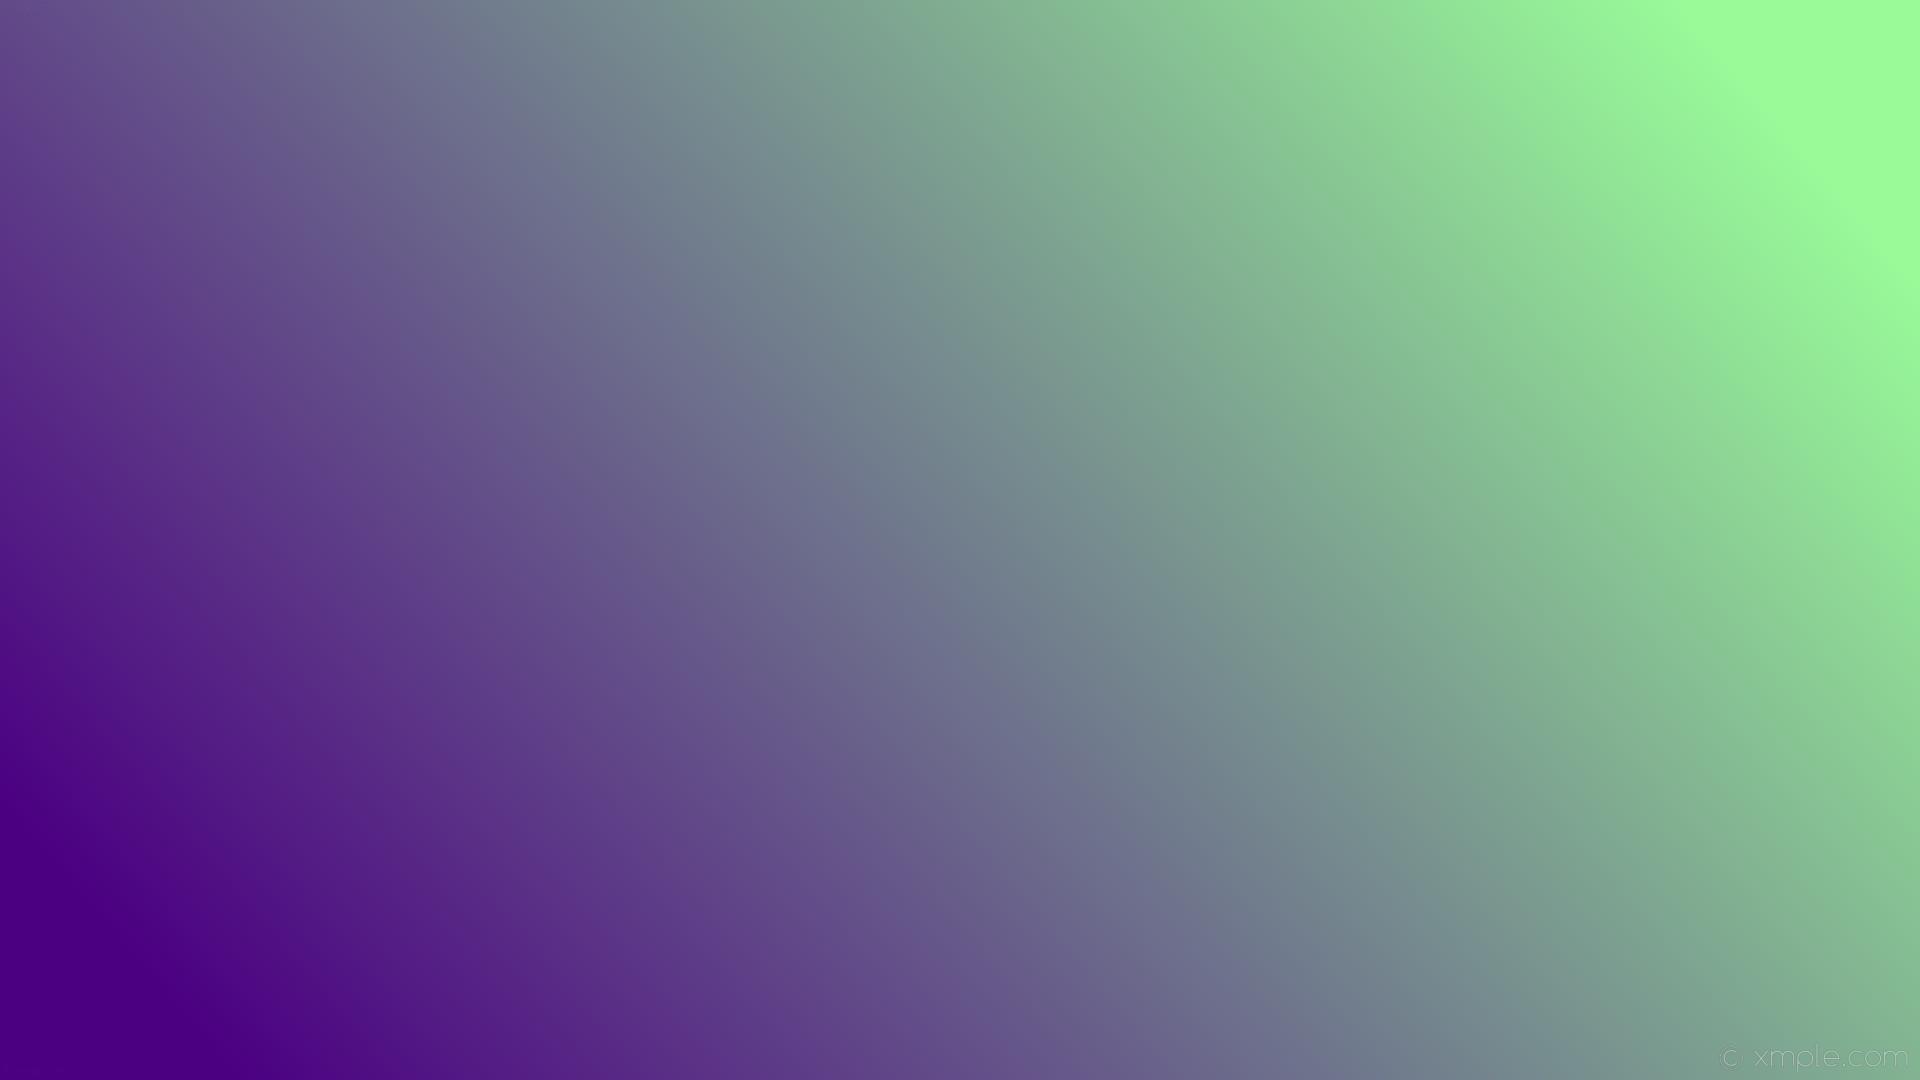 wallpaper linear gradient green purple pale green indigo #98fb98 #4b0082 15°